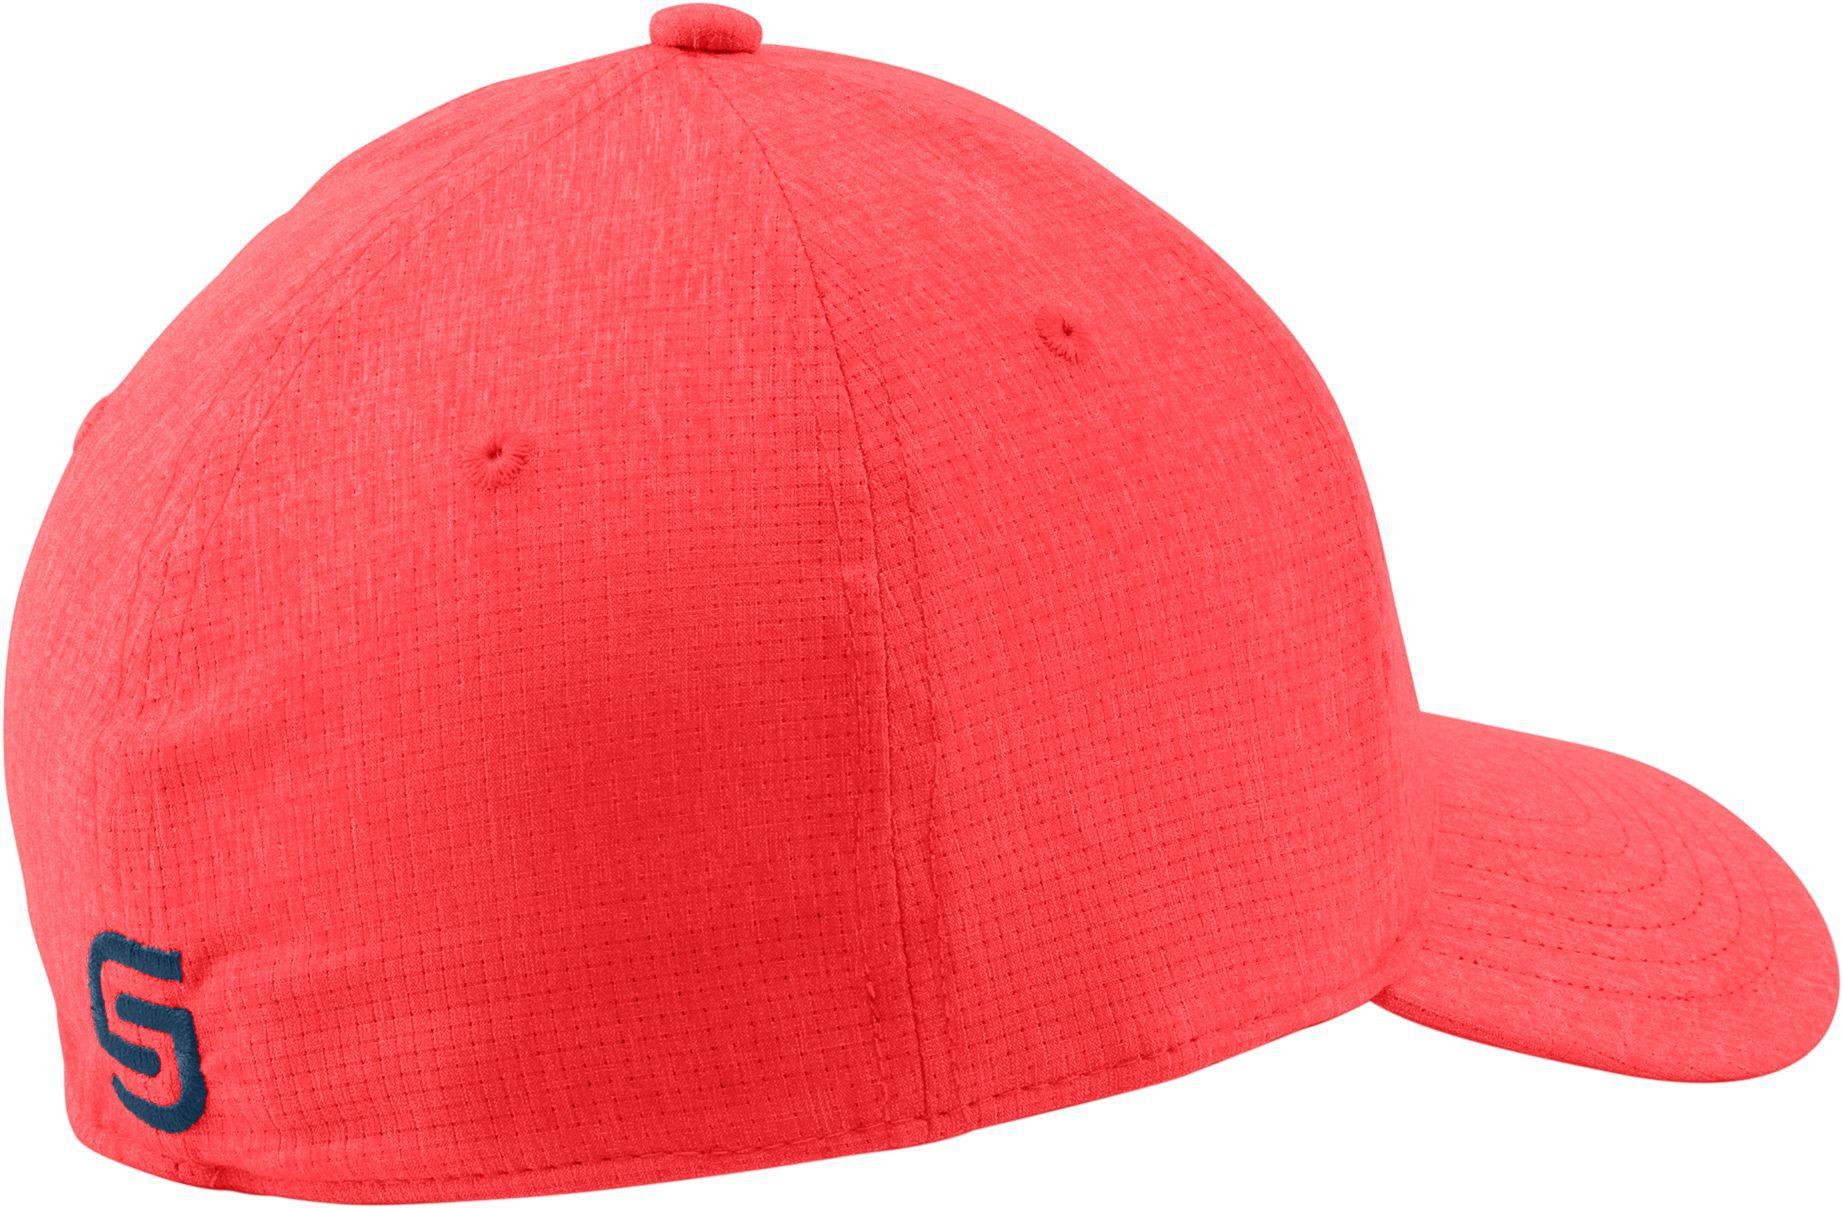 c55232f13bd663 Lyst - Under Armour Jordan Spieth Official Tour 2.0 Golf Hat in Red ...